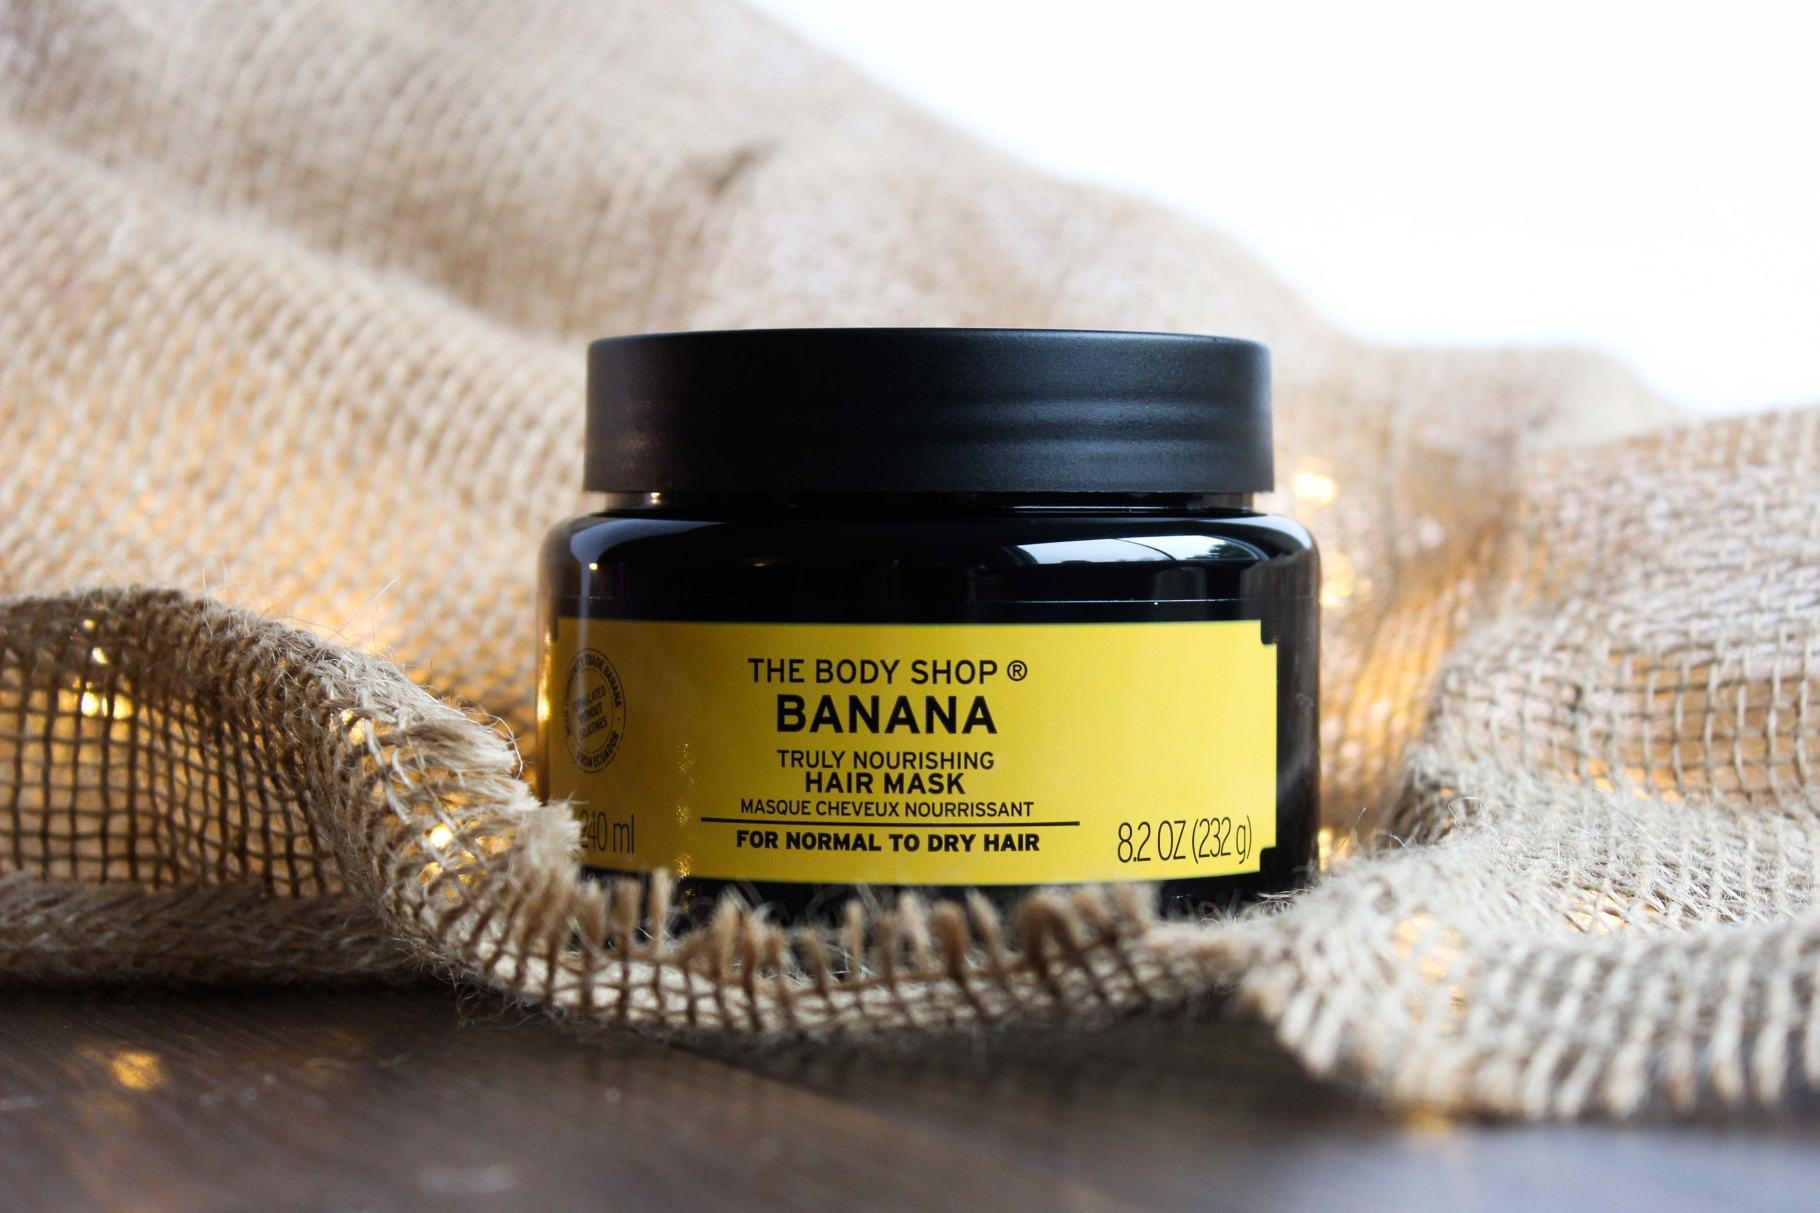 the body shop nourishing banana hair mask